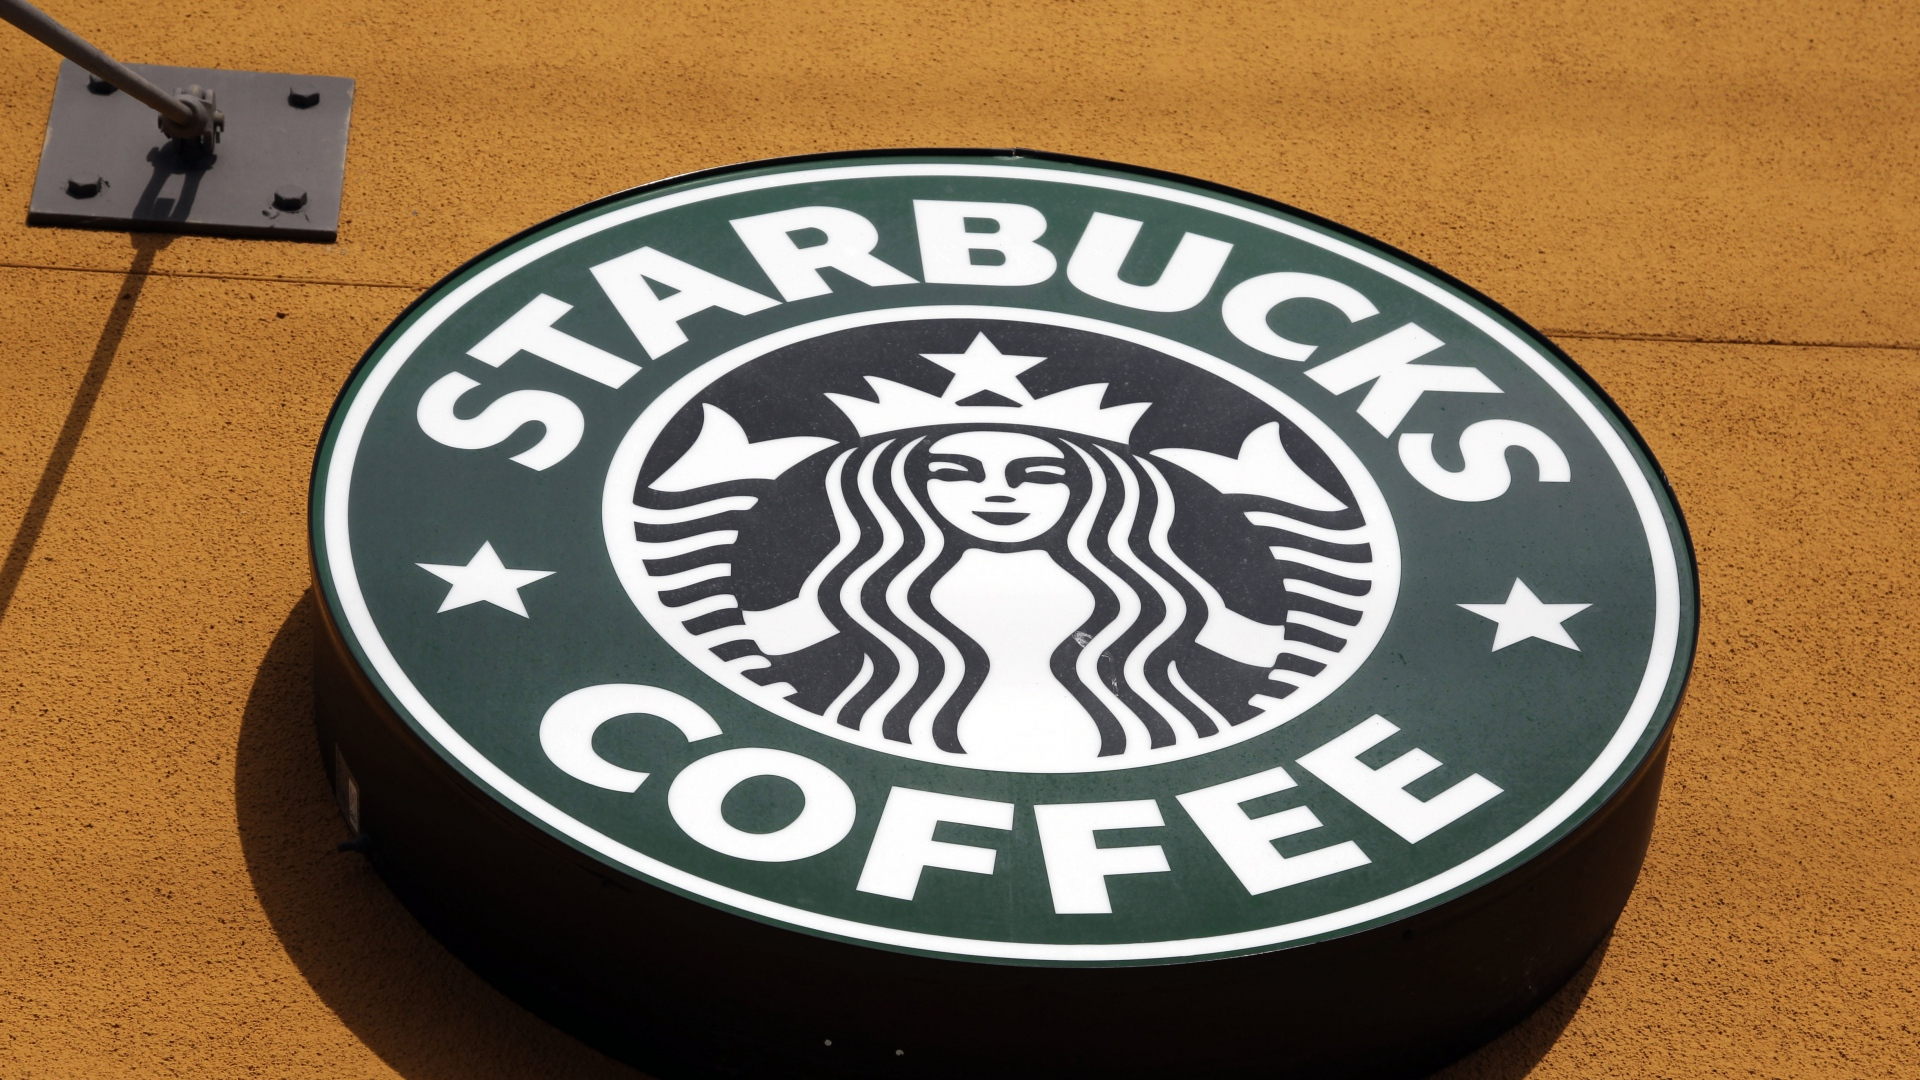 Starbucks Coffee Sign Logo Desktop Wallpaper 61868